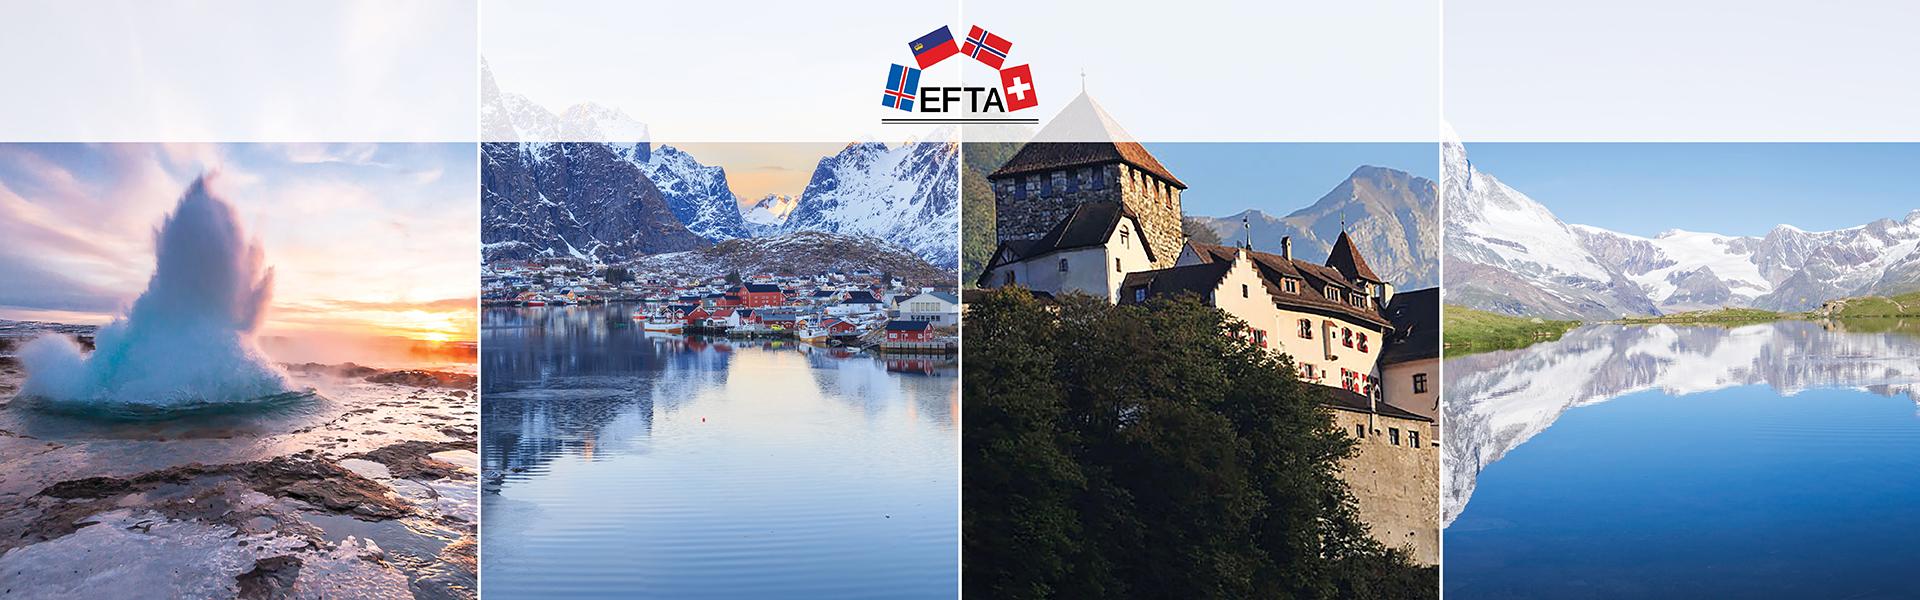 European Free Trade Association |